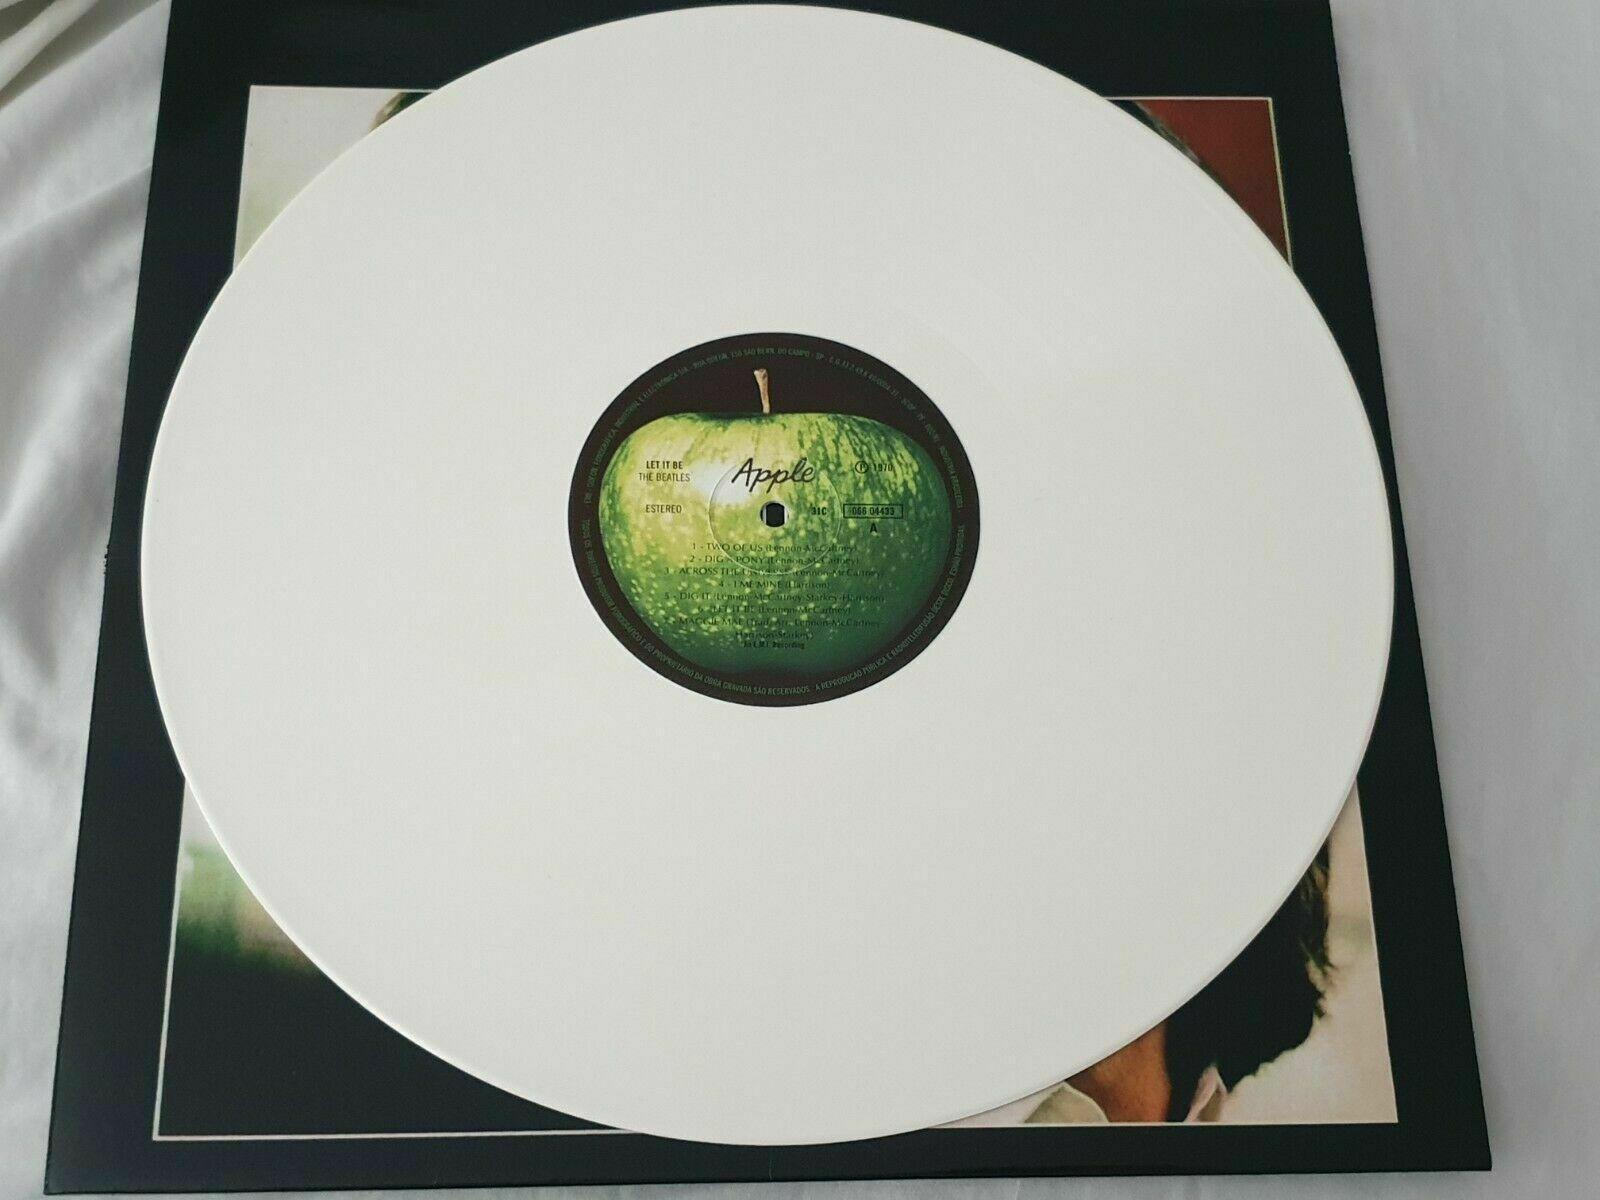 The Beatles - Let It Be - White Vinyl - Brazil - New/Unplayed